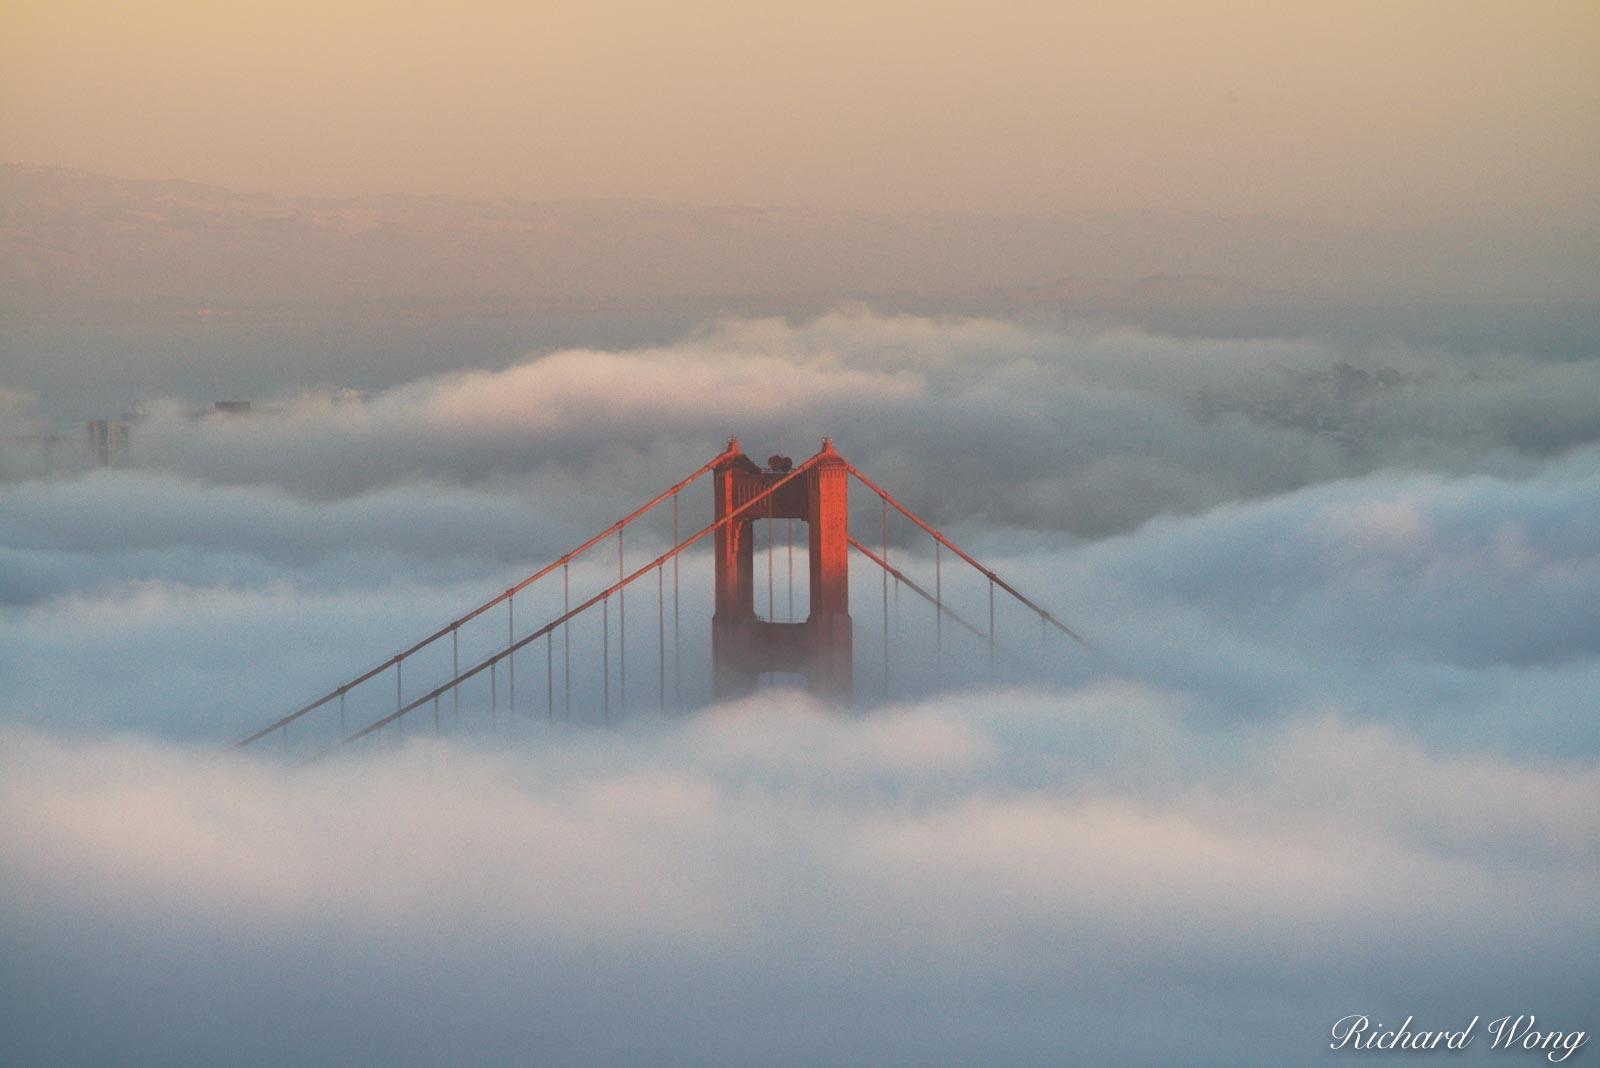 bridges, cloud, coast, foggy, ggnra, golden gate bridge, golden gate national recreation area, hawk hill, iconic landmarks, landmark, low clouds, marin county, marin headlands, northern california, sa, photo